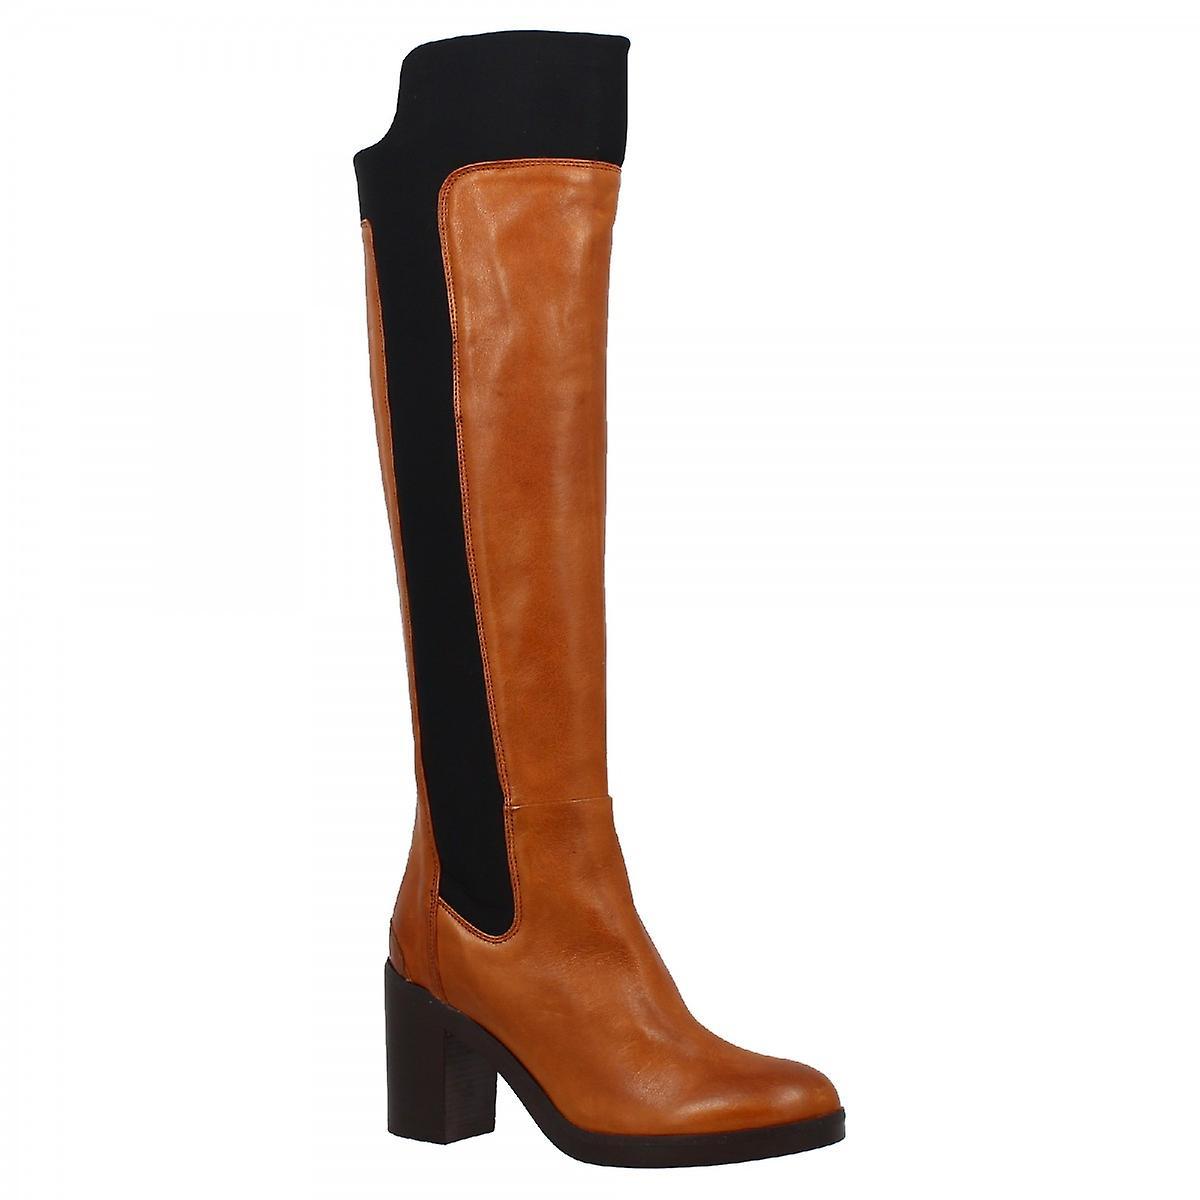 Leonardo Shoes Women's handmade heels knee high boots tan black leather back zip Ocsxm